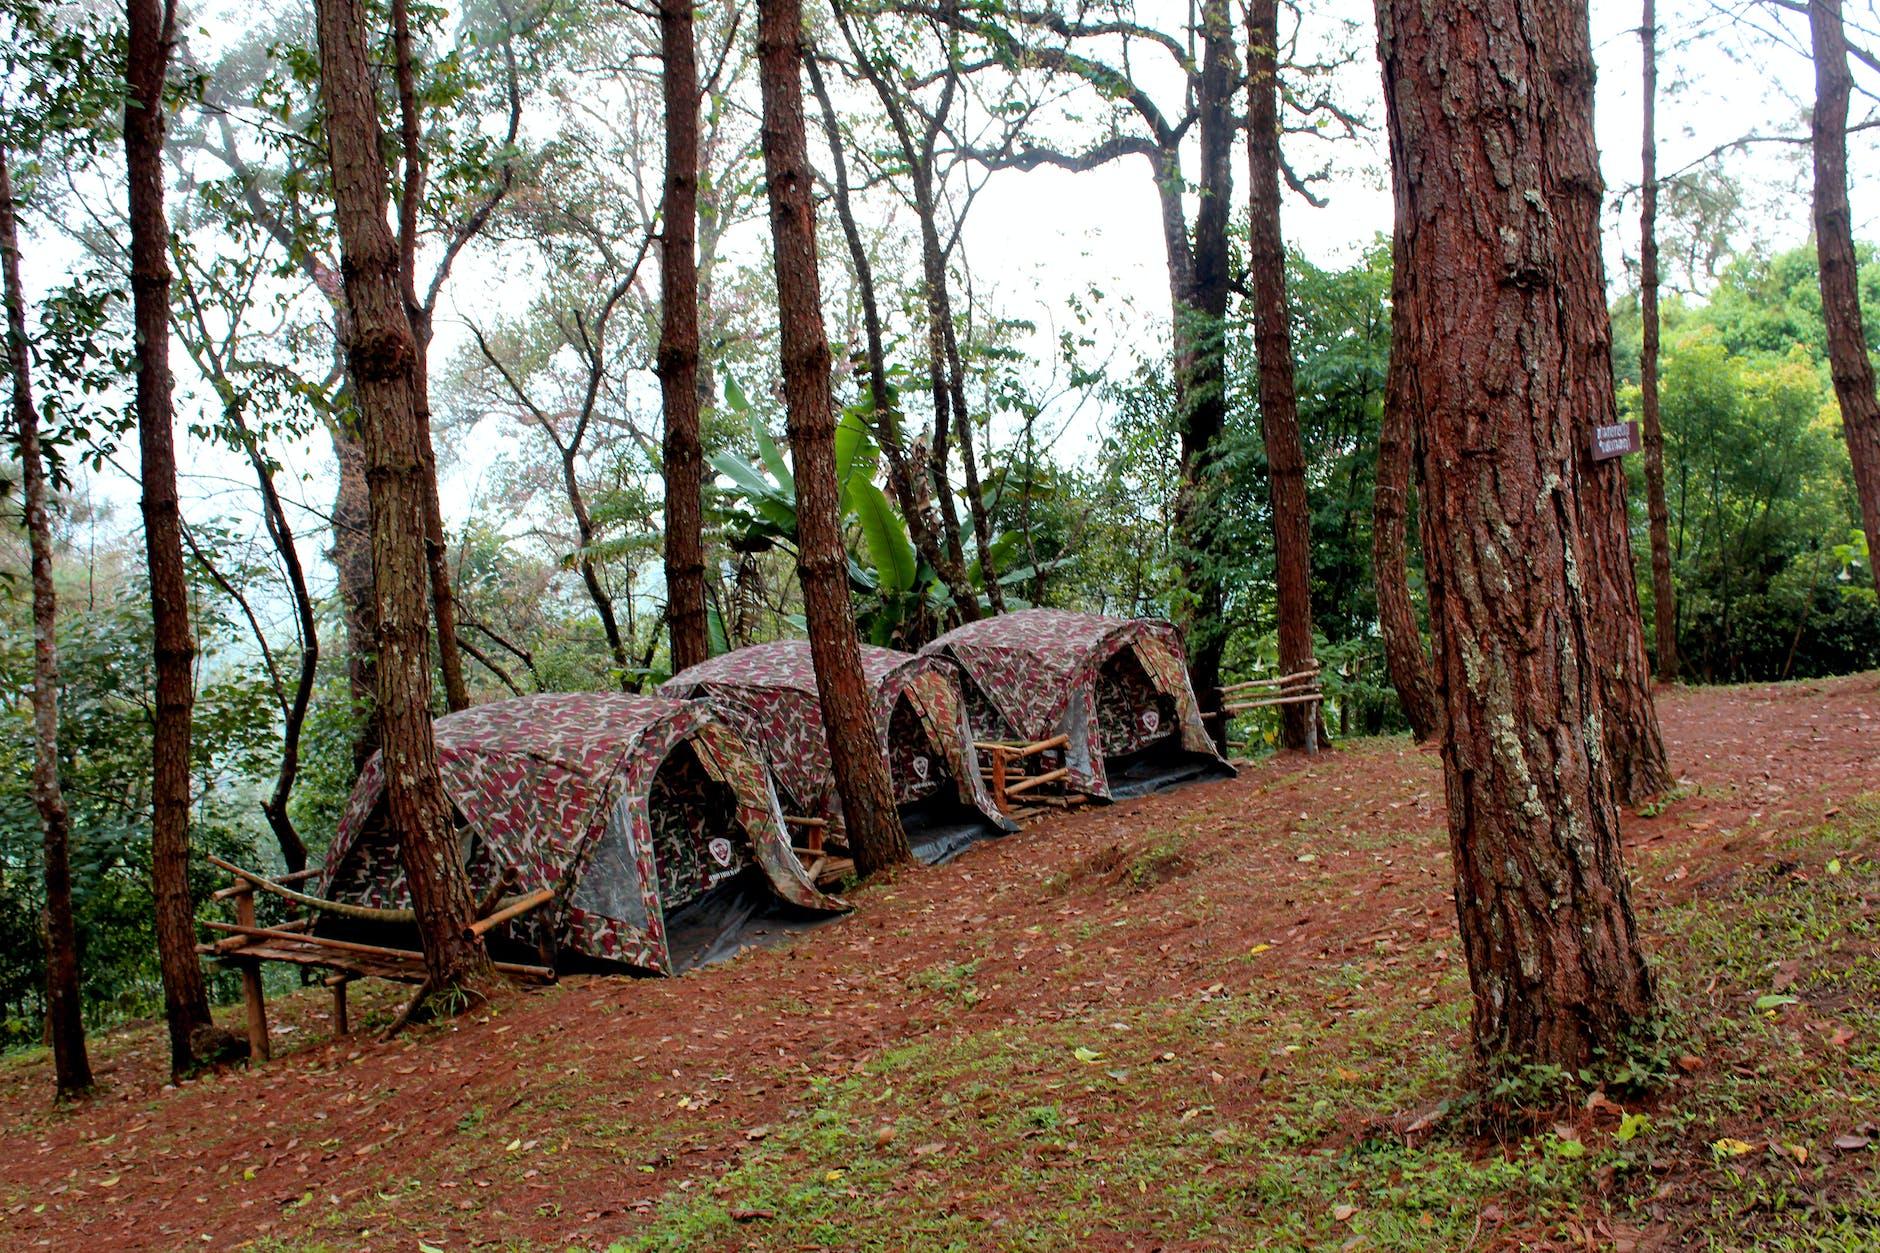 3 brown tents beside green leaf trees